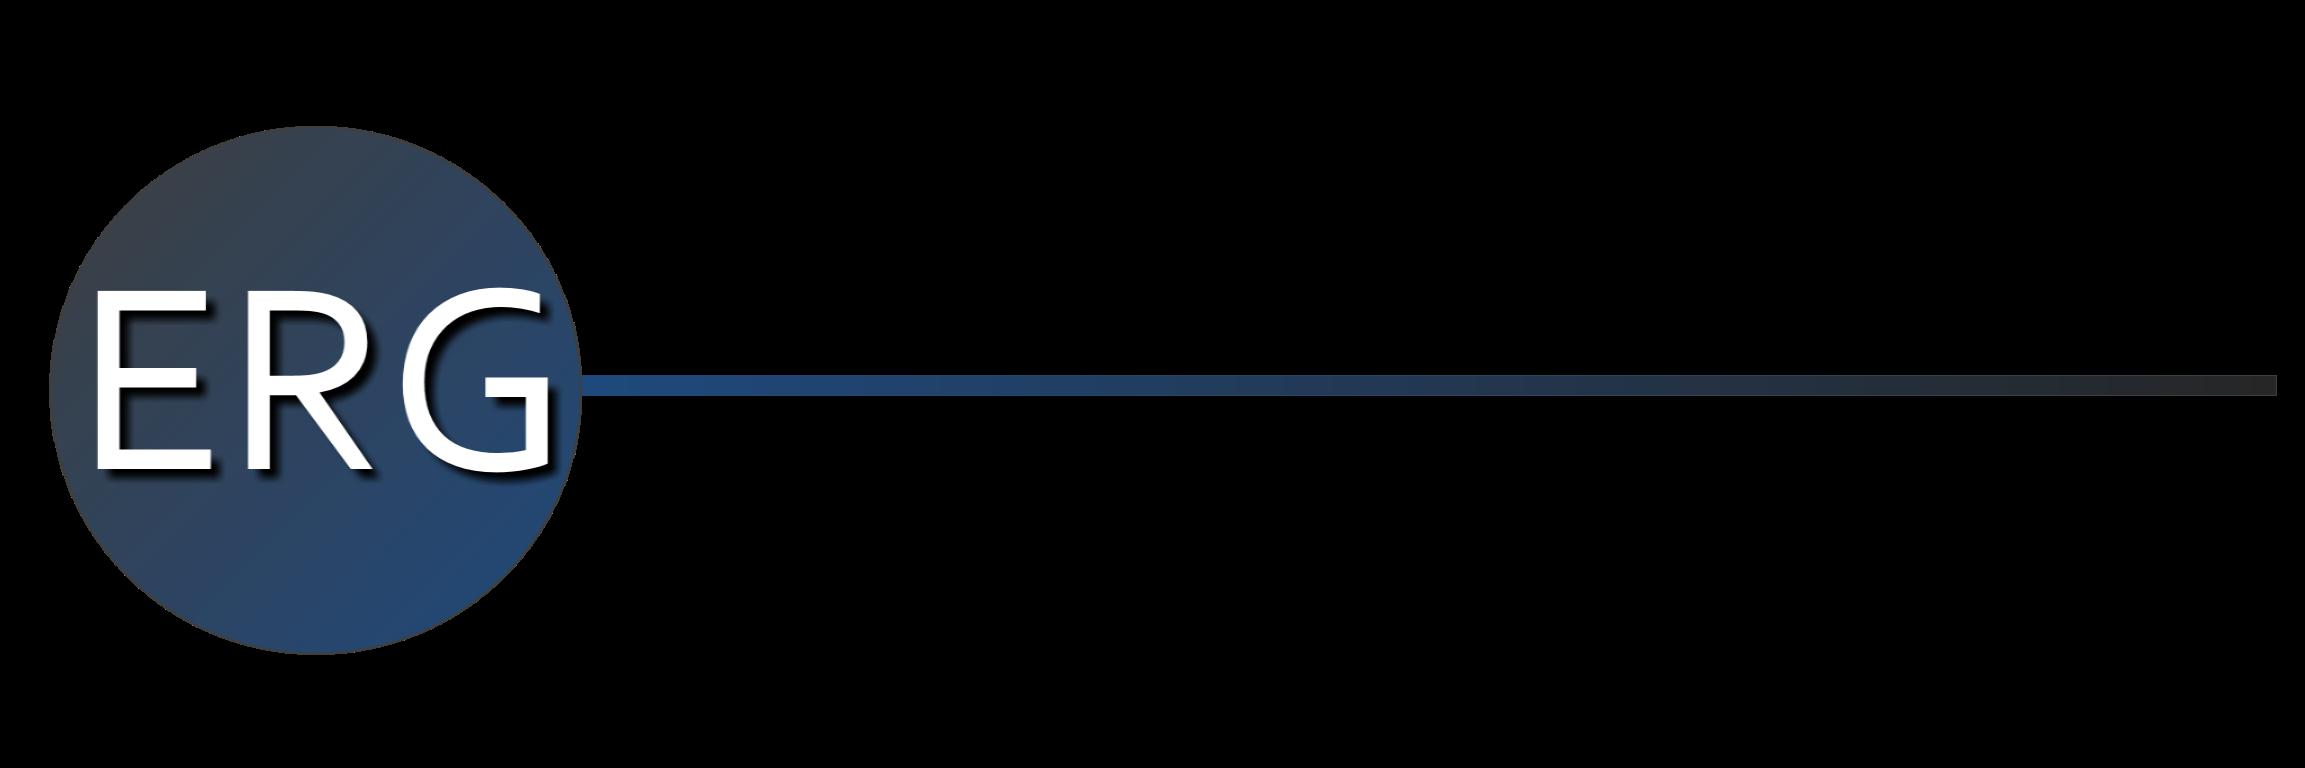 ERG-Logo-New-Lg.png